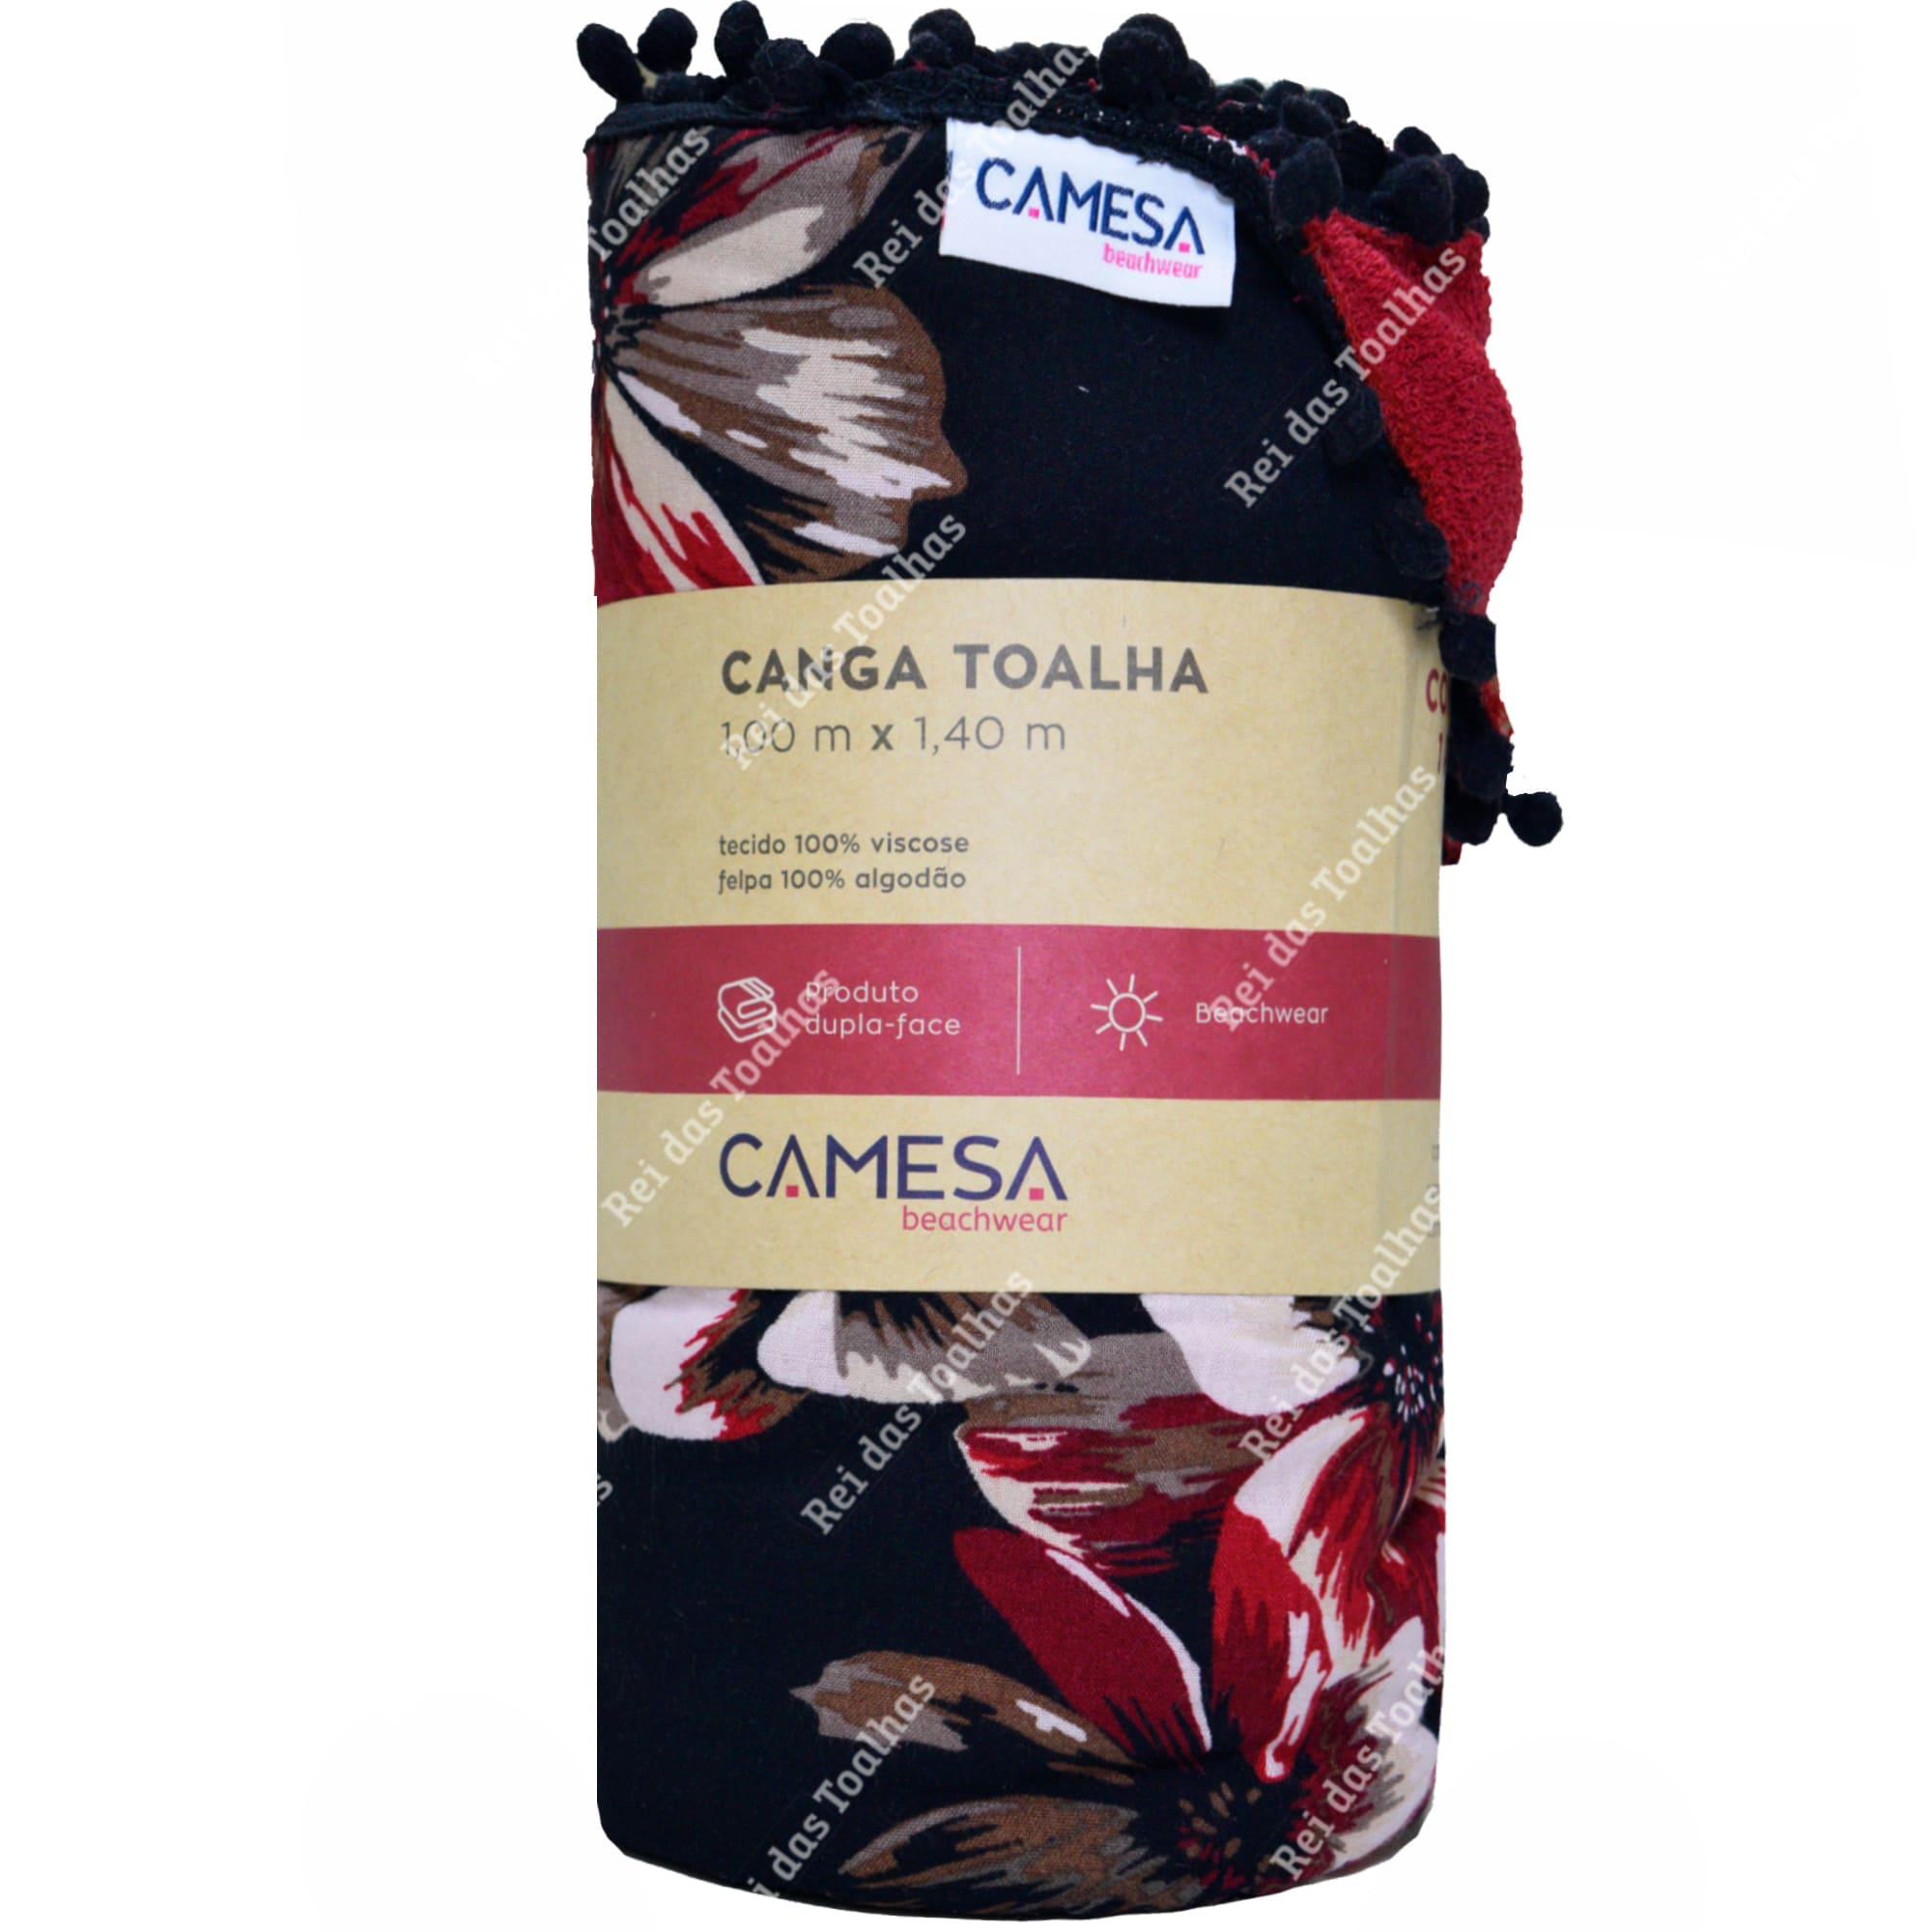 Toalha Canga Beachwear Melissa Vermelho Dupla-Face 100m X 140m CAMESA